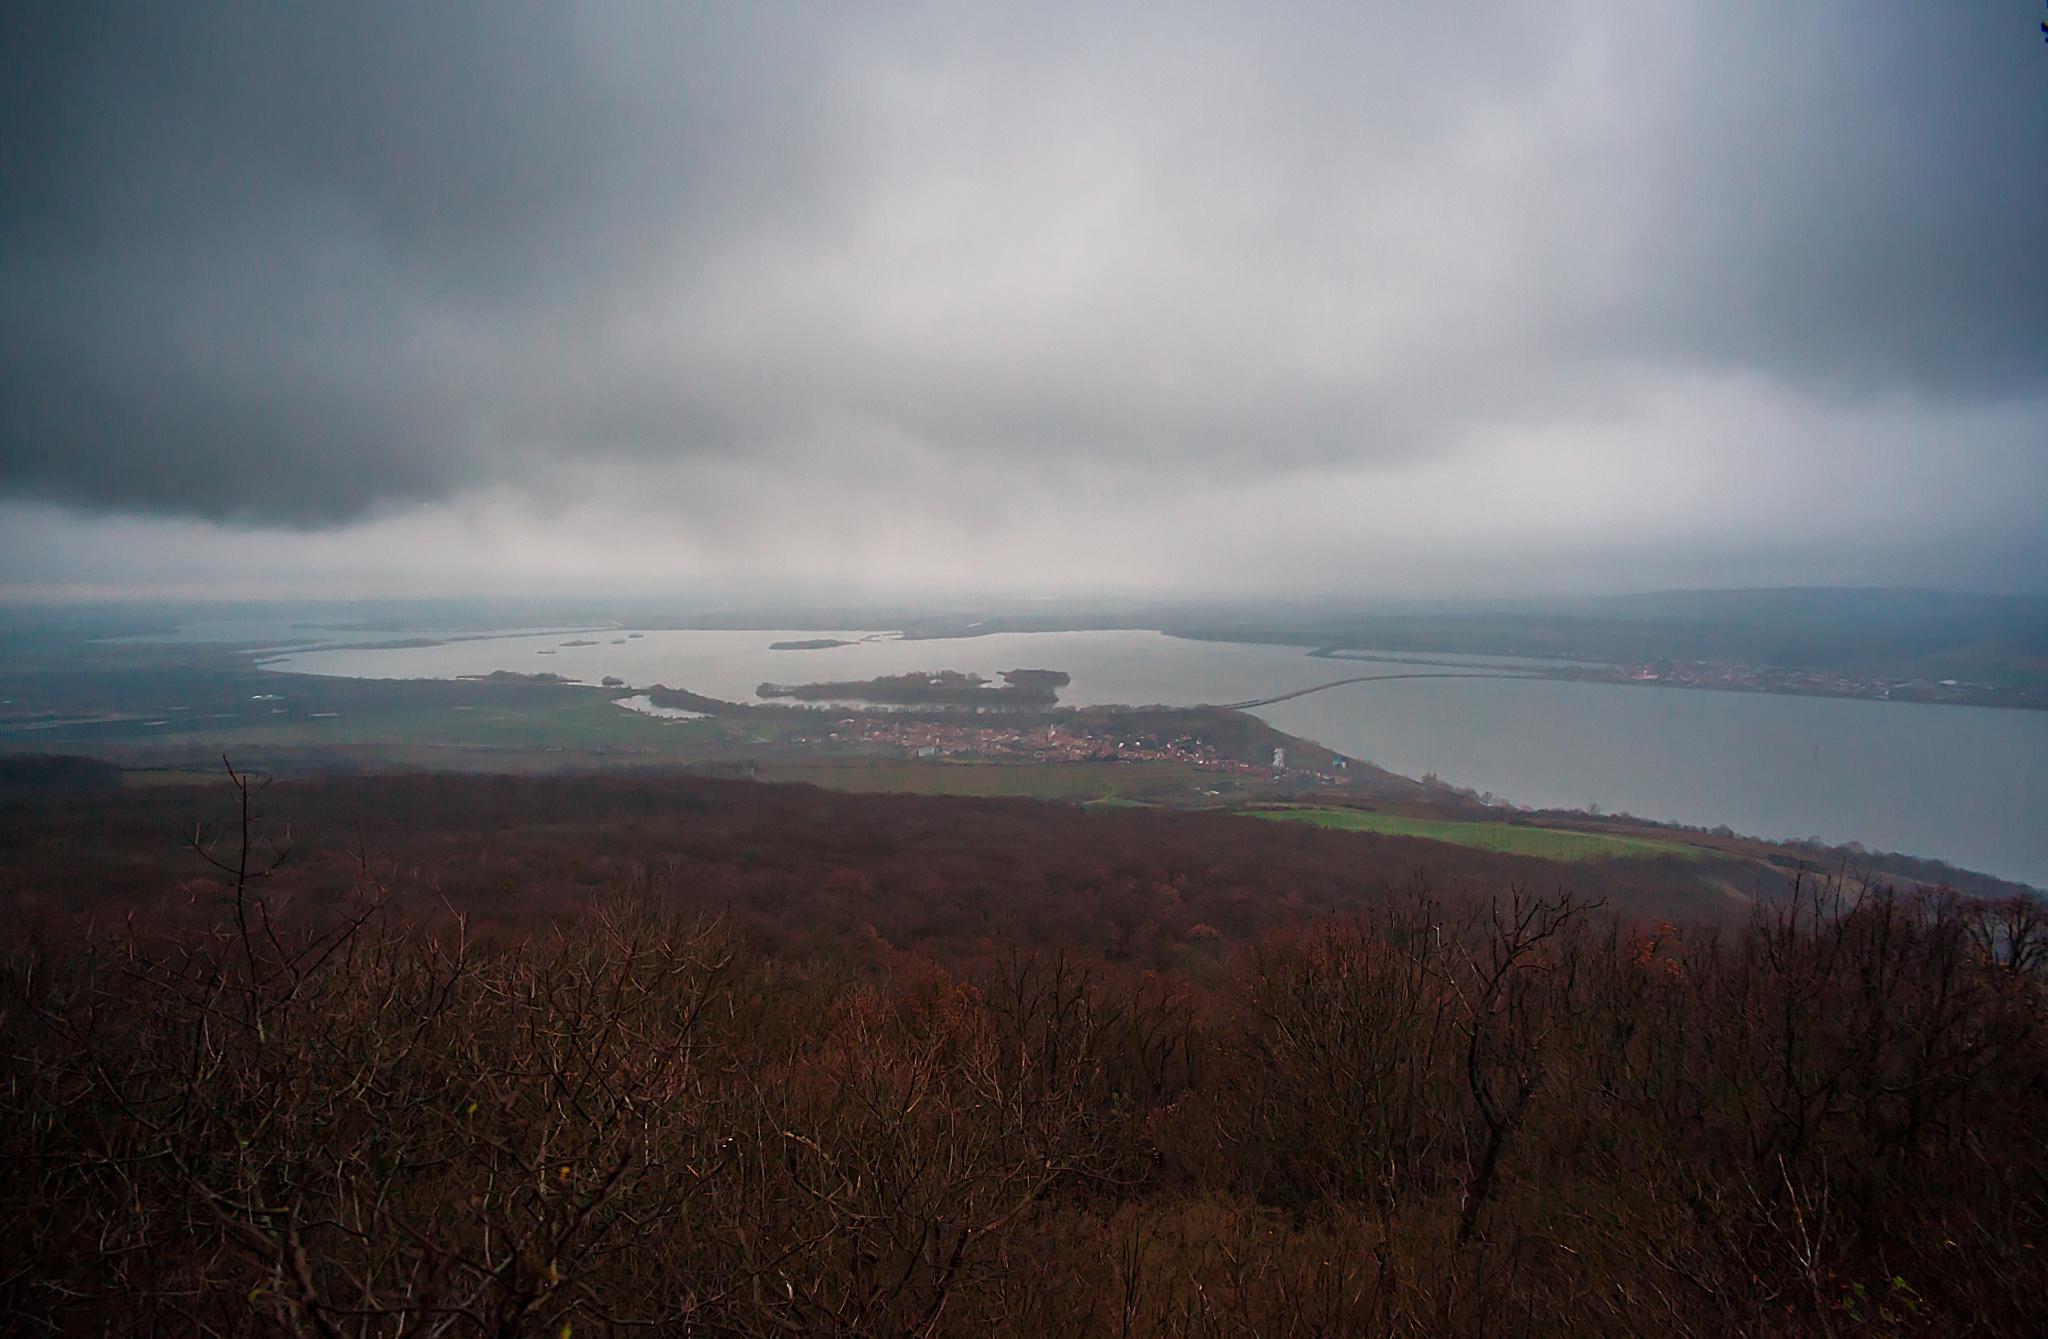 bad weather by Matej Kmet